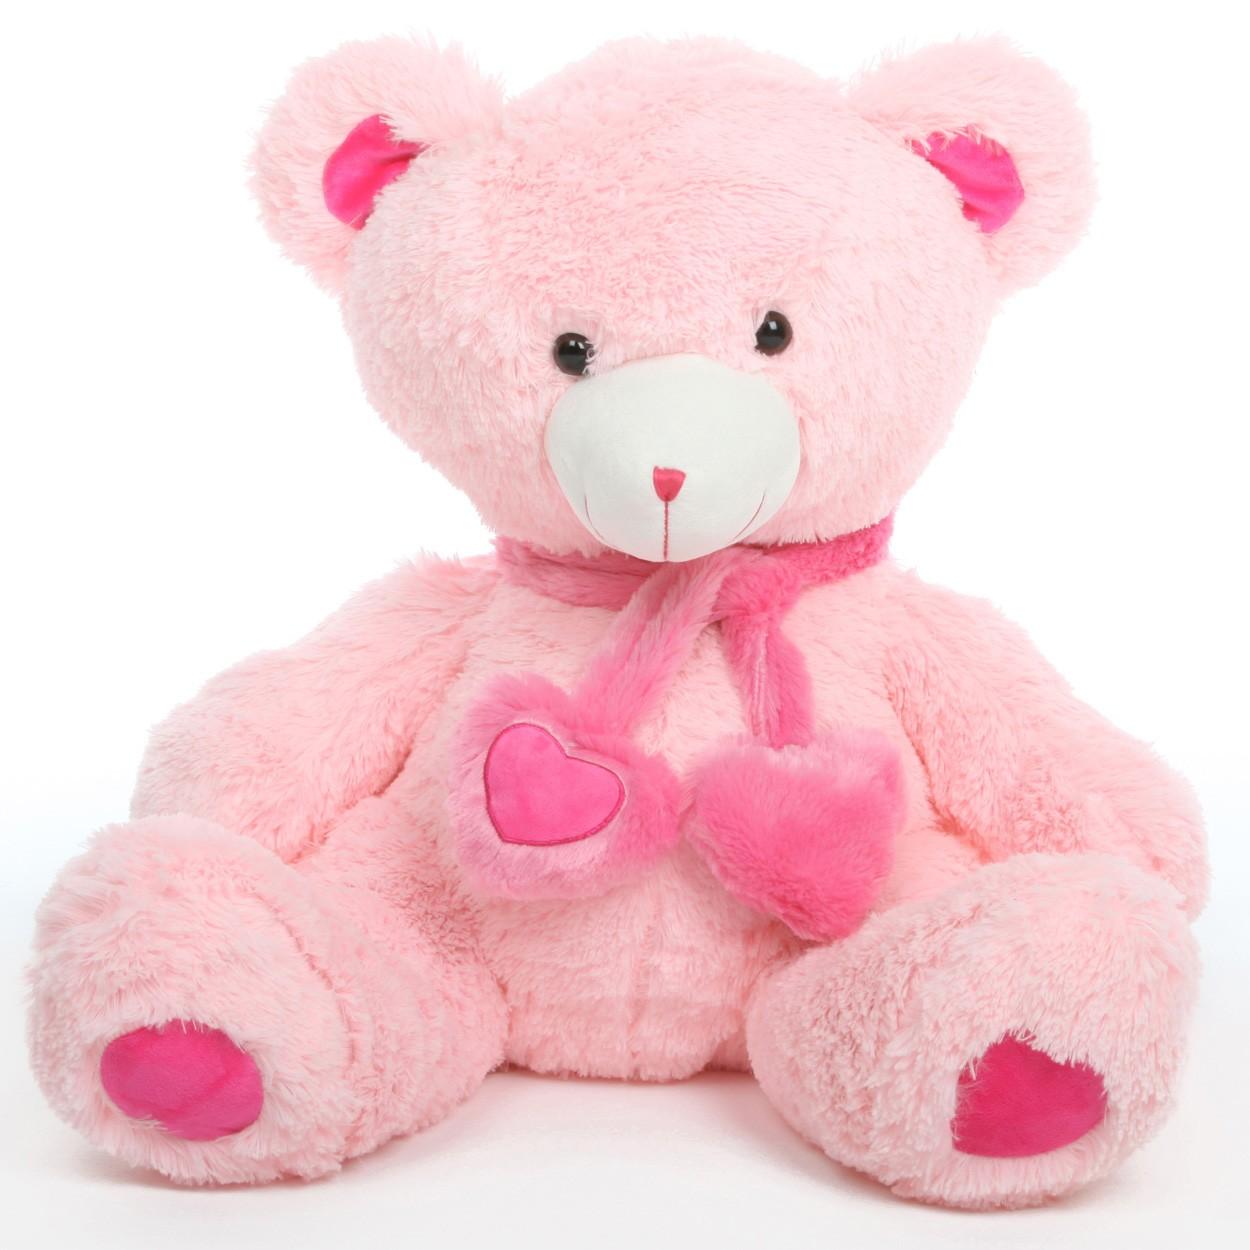 Pink cute teddy bear wallpapers - photo#8